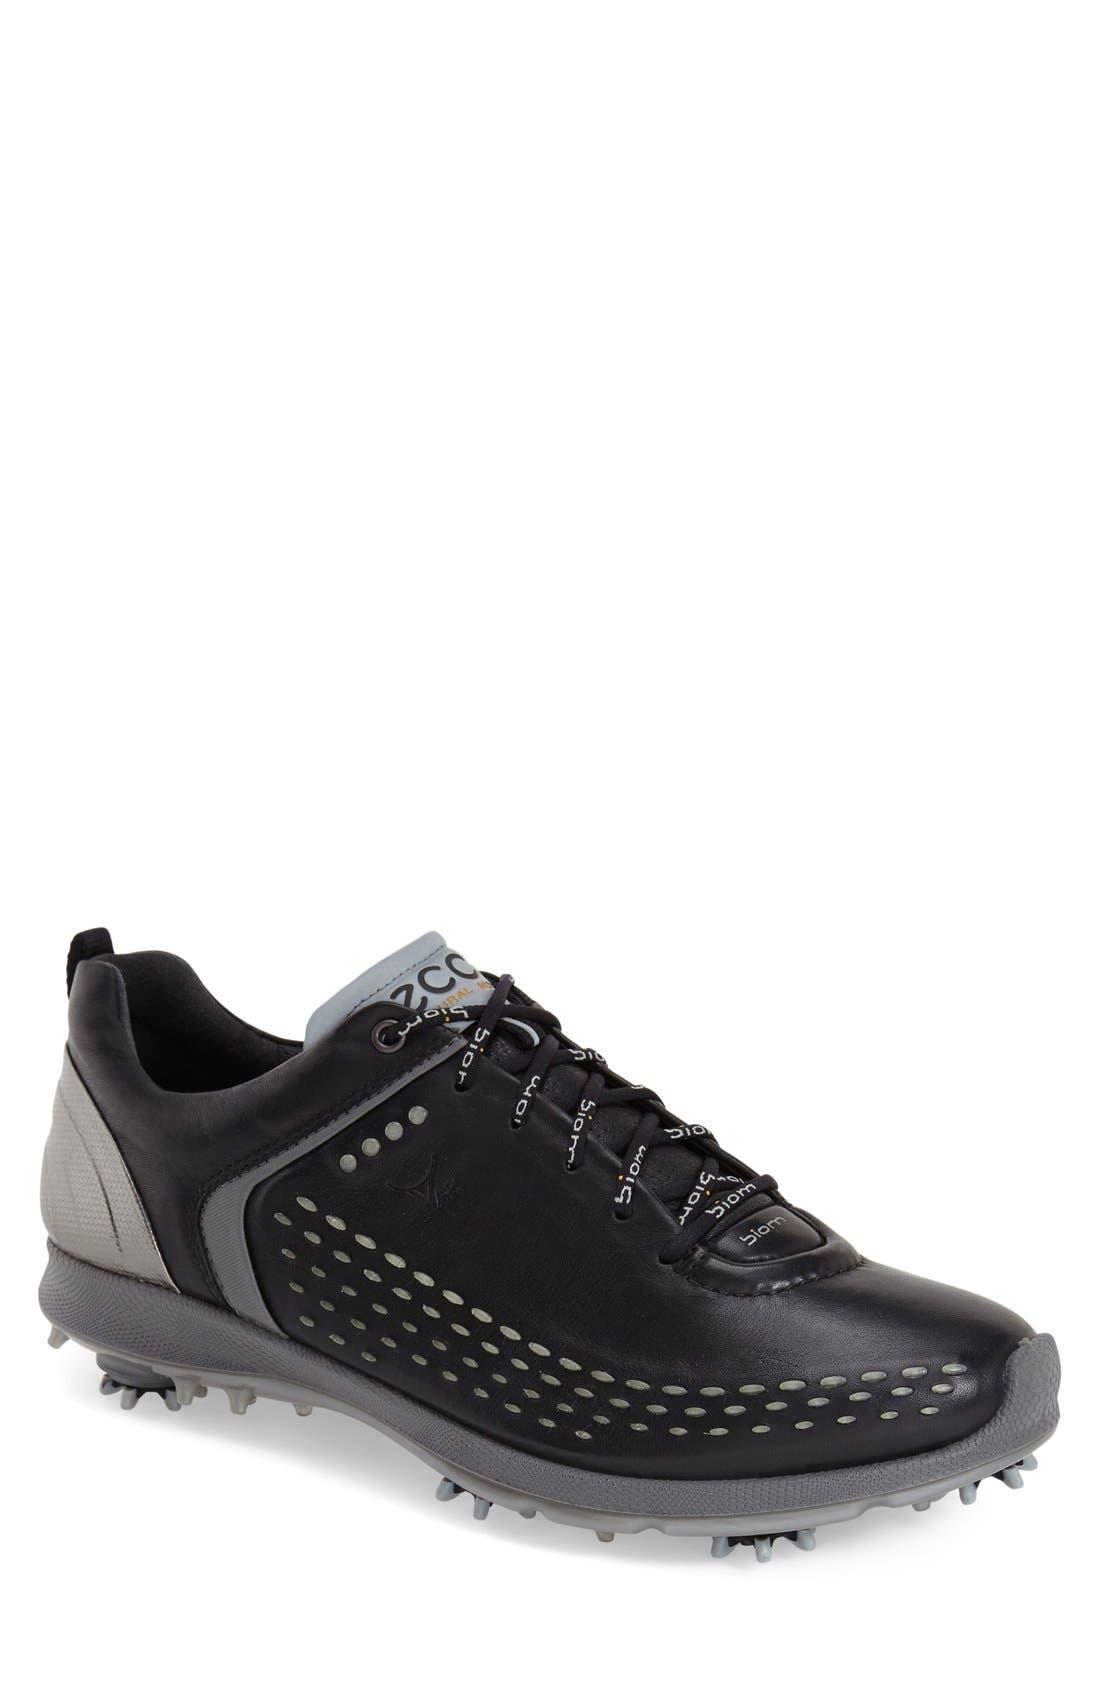 BIOM Hydromax Waterproof Golf Shoe,                         Main,                         color, Black/ Transparent